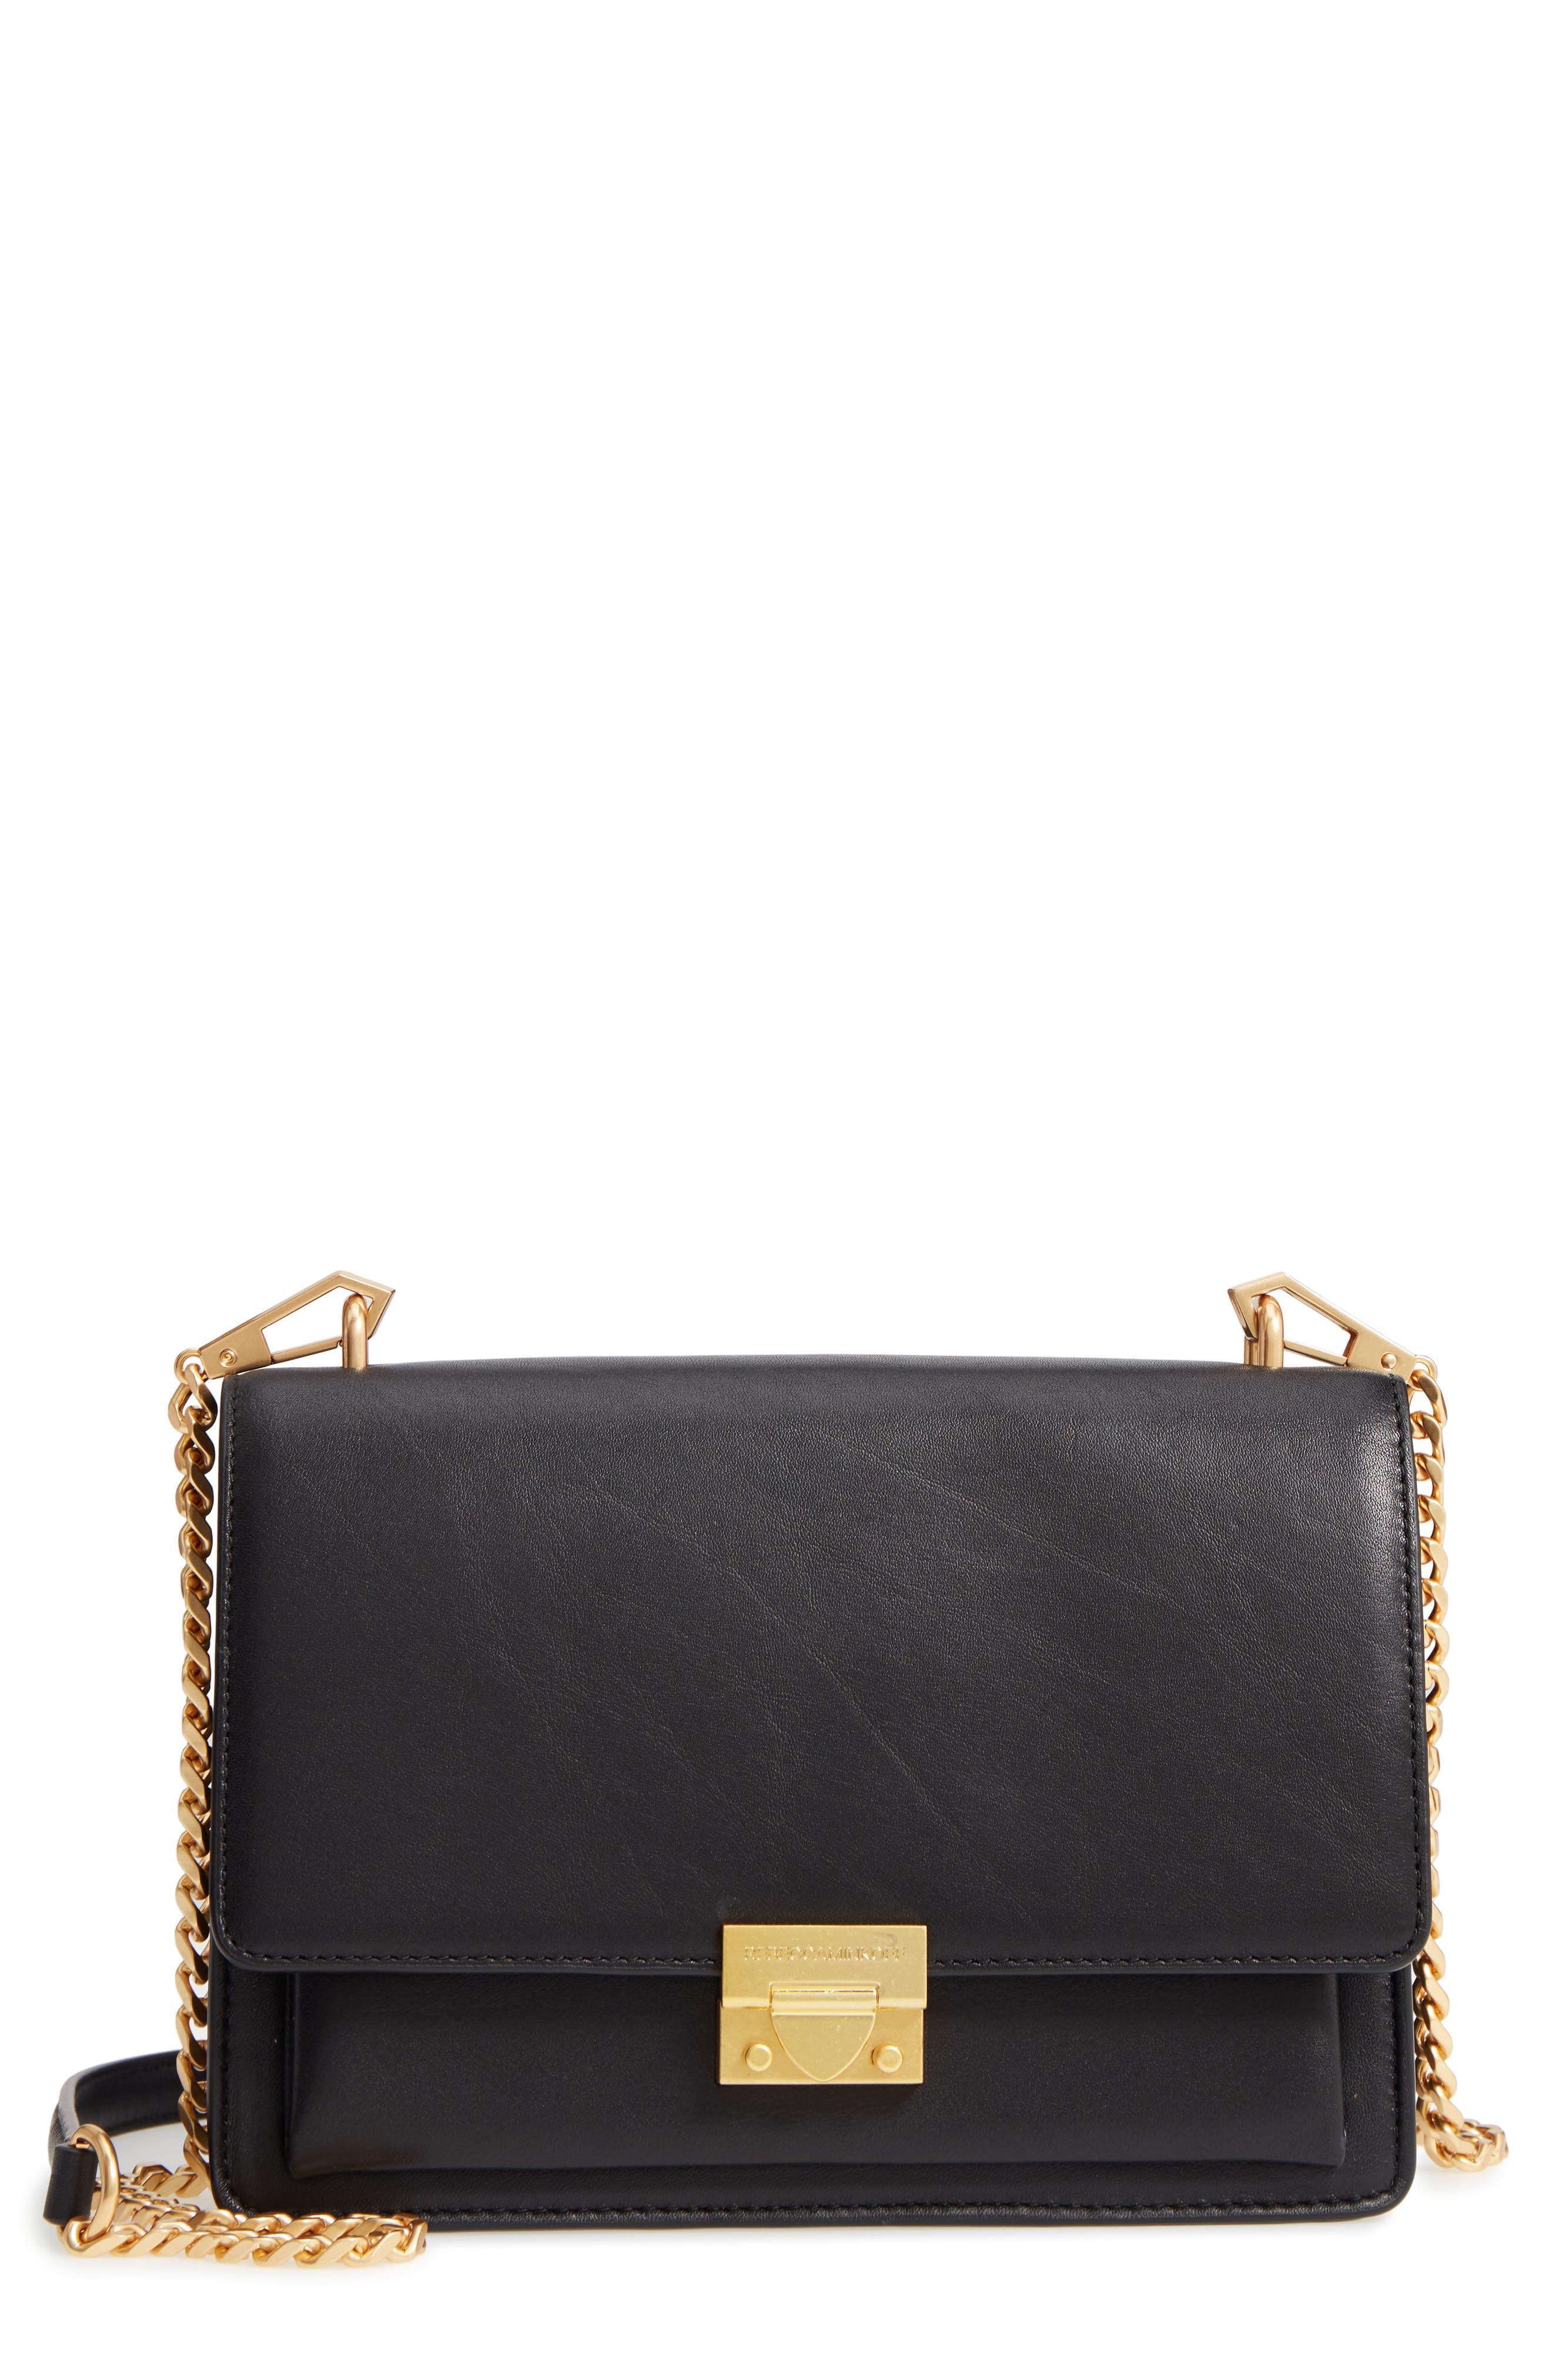 Medium Christy Leather Shoulder Bag,                             Main thumbnail 1, color,                             001